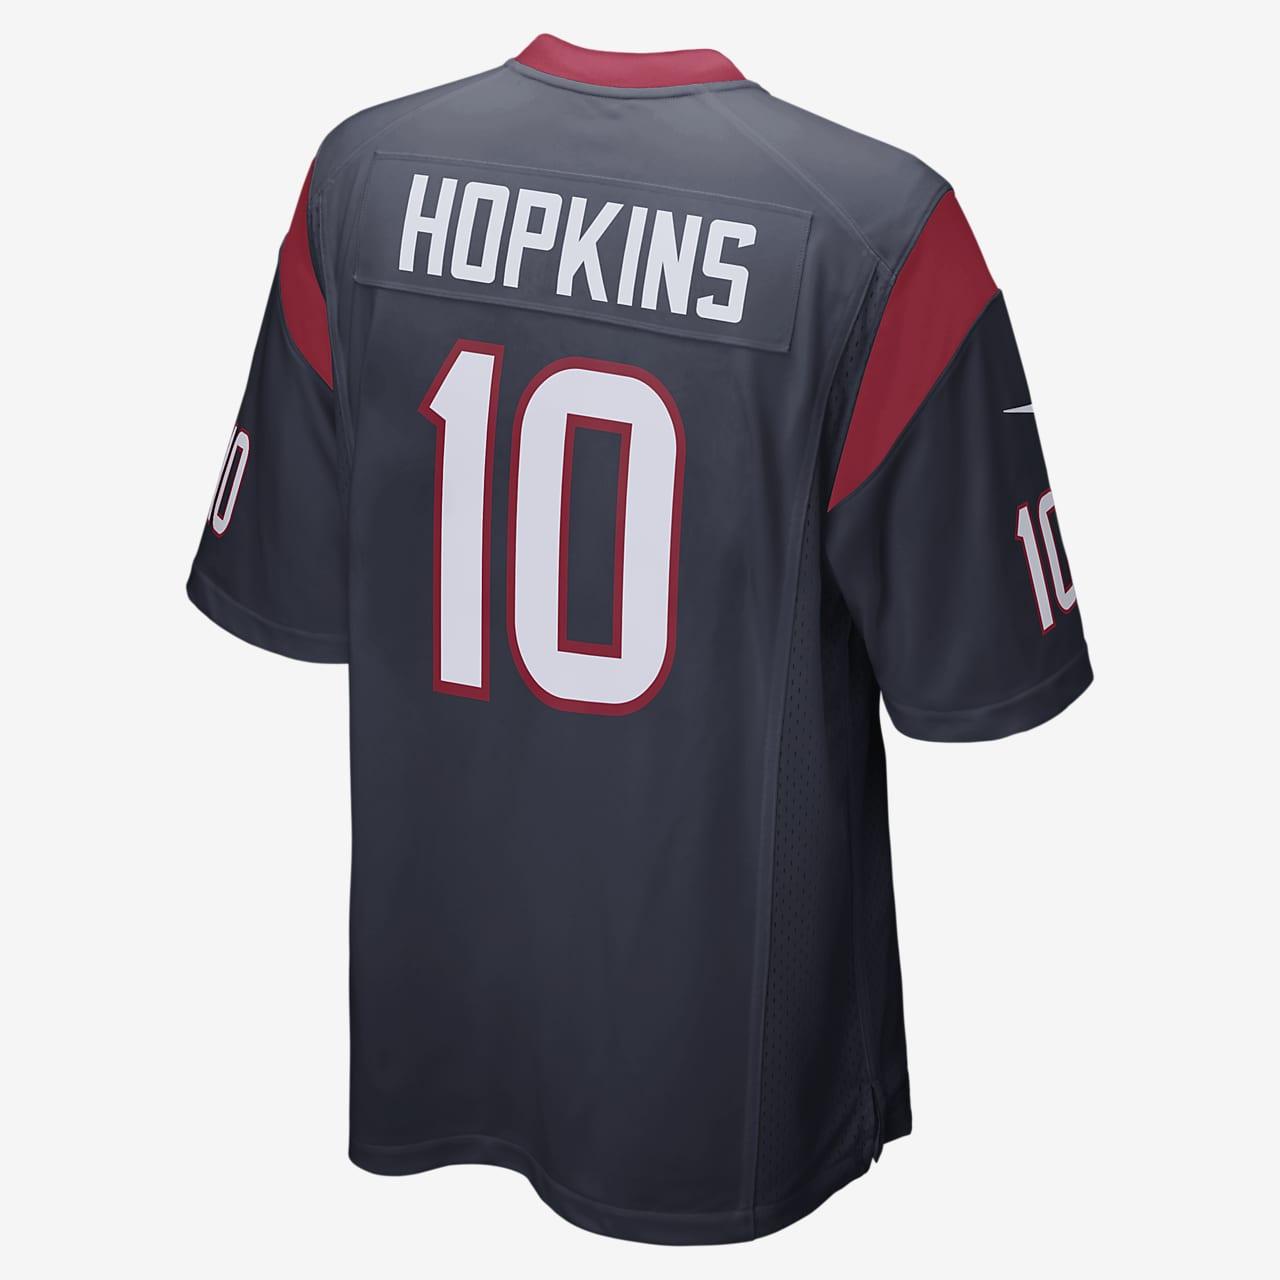 NFL Houston Texans (DeAndre Hopkins) Men's American Football Home Game Jersey